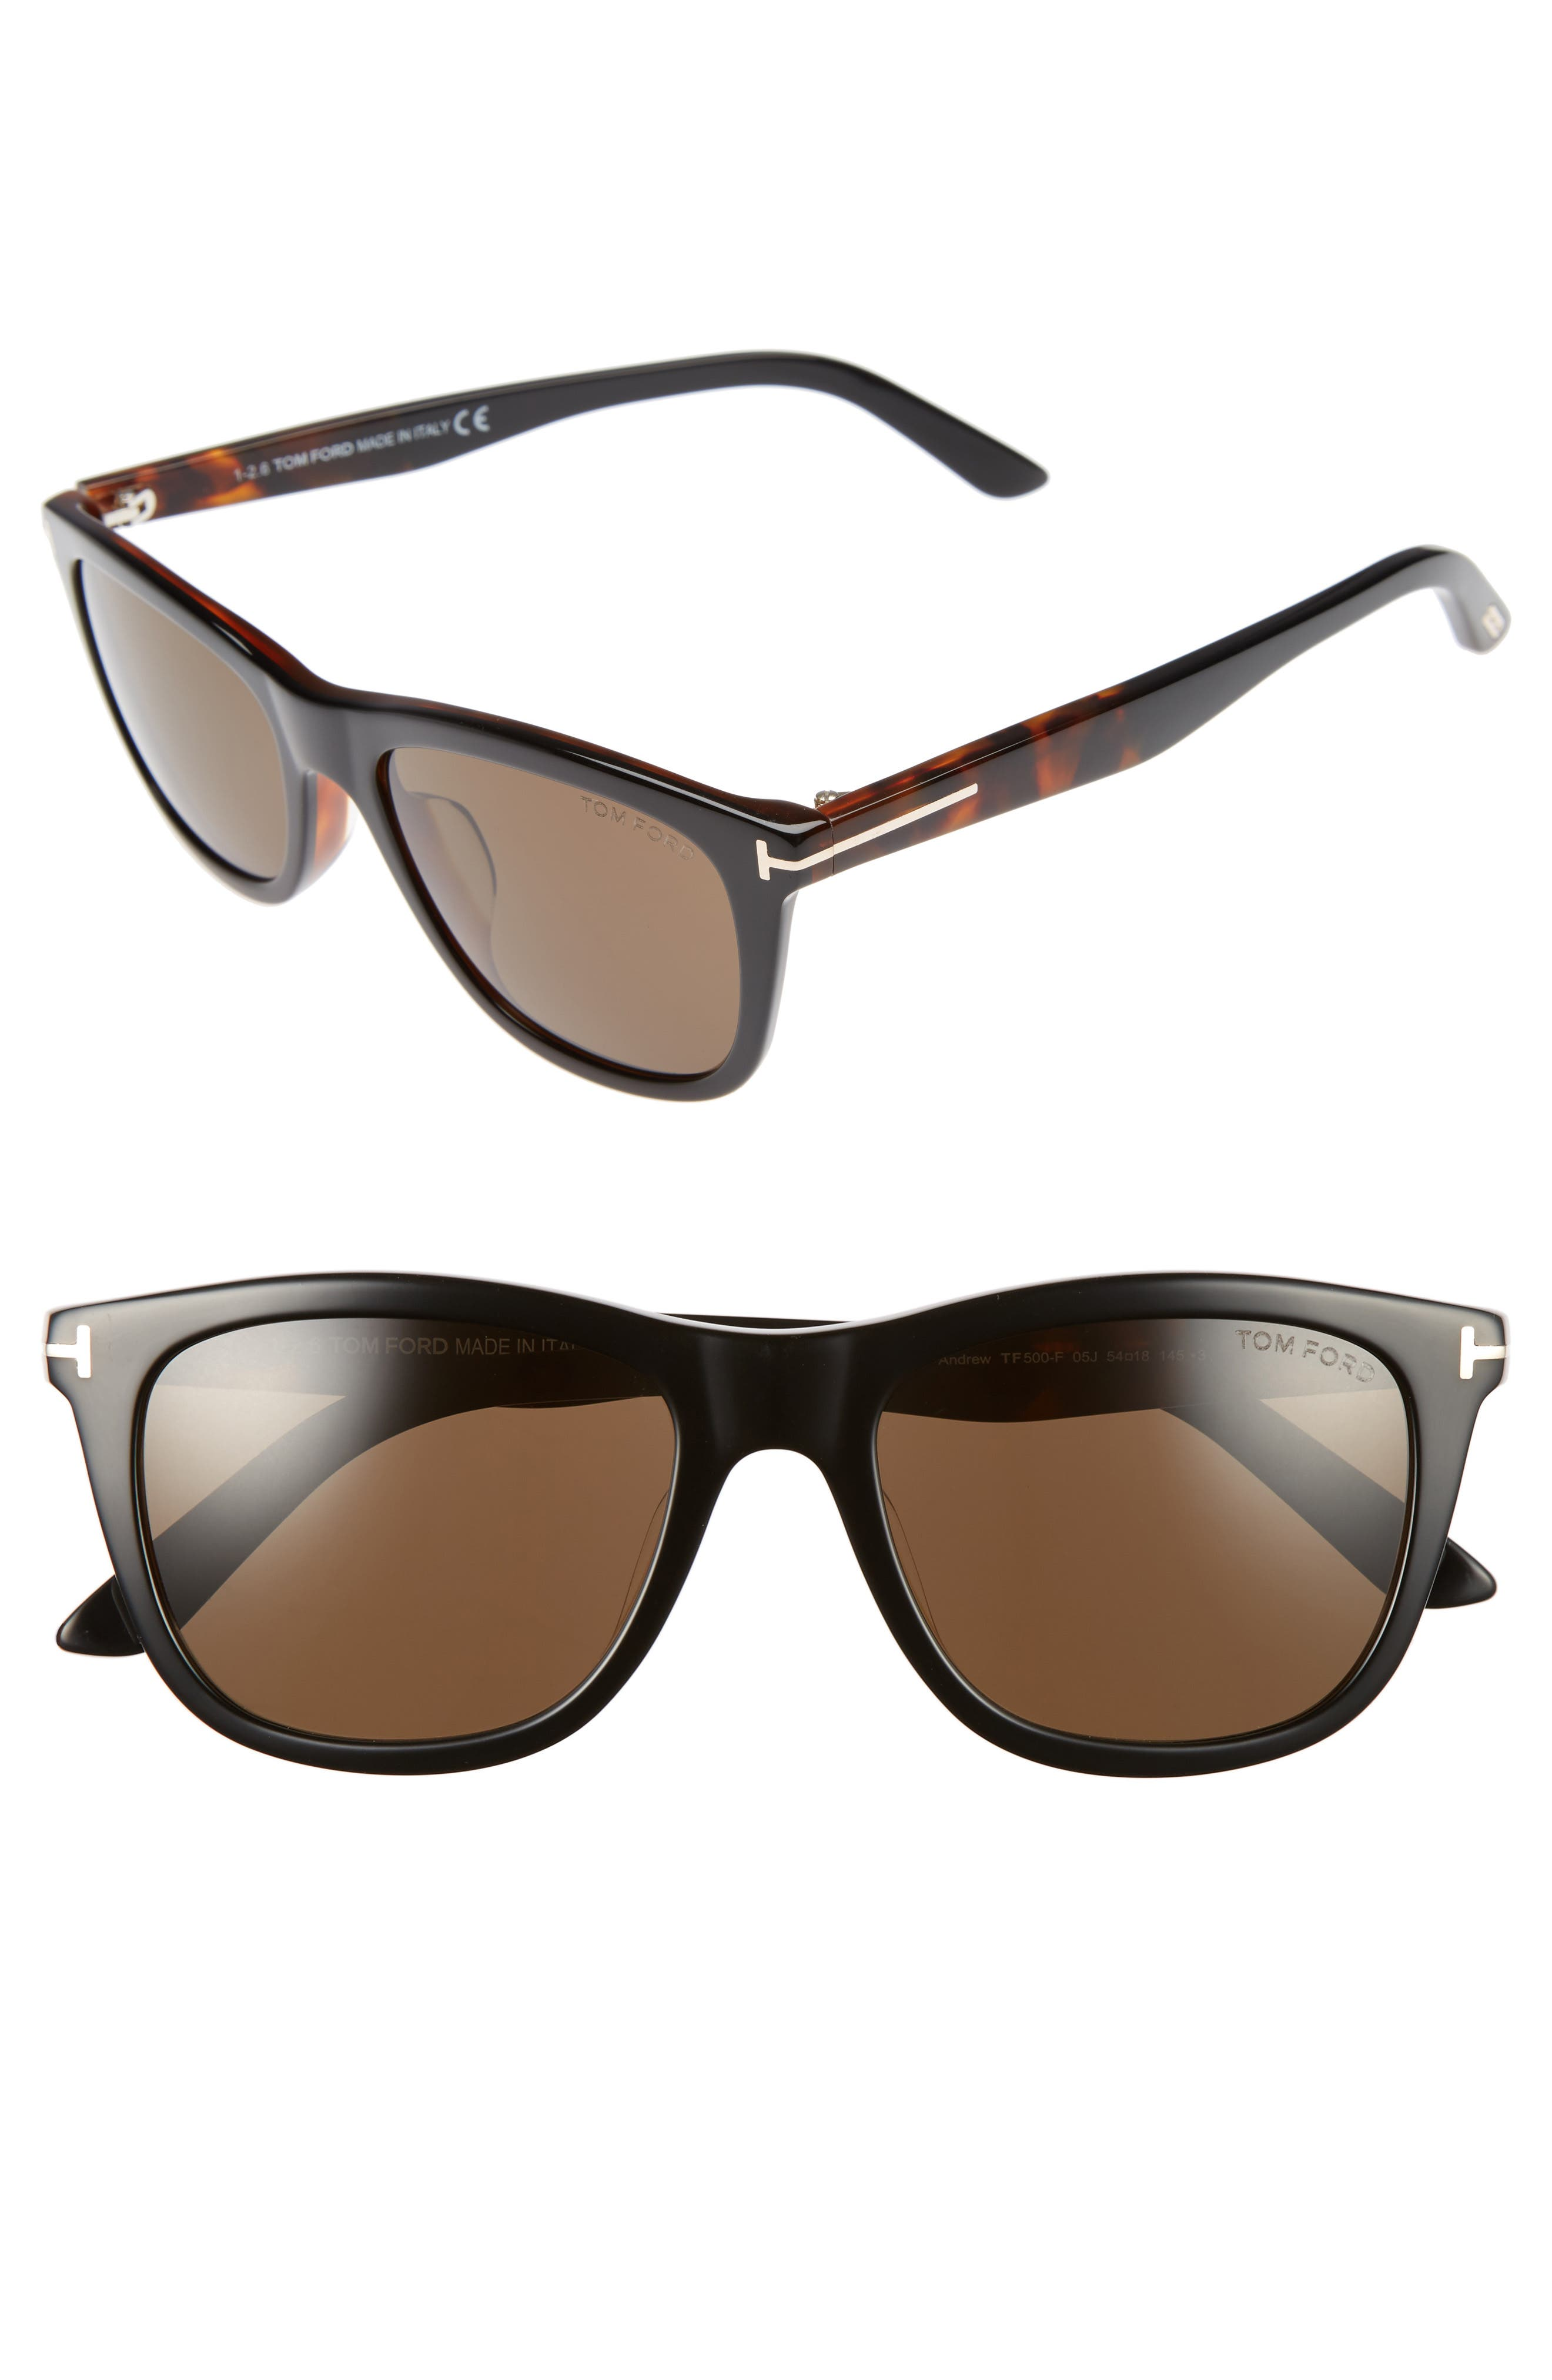 Andrew 54mm Rectangular Sunglasses,                             Main thumbnail 1, color,                             001